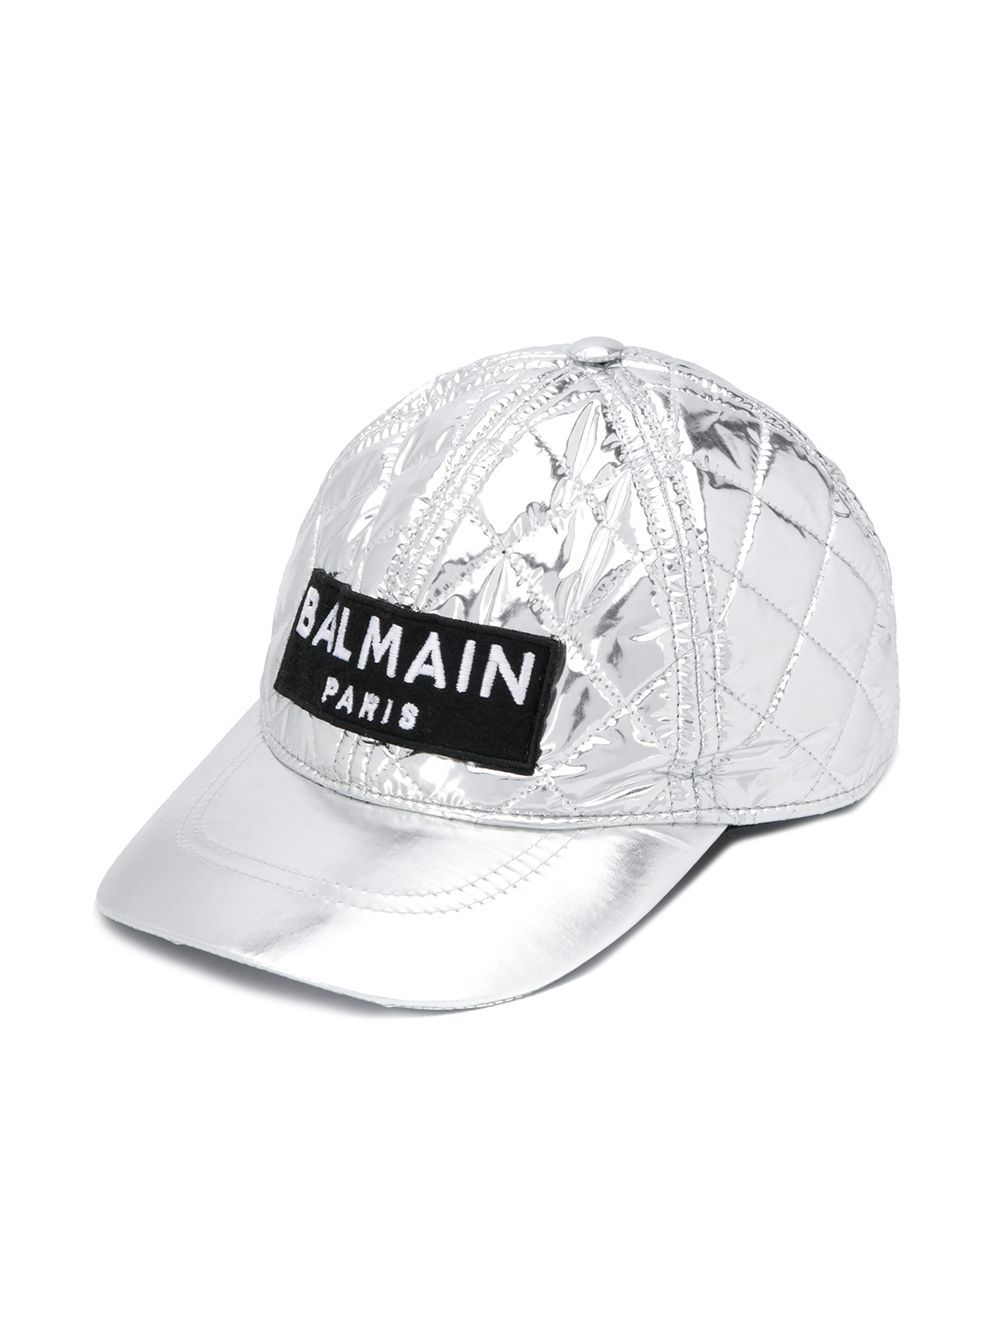 6L0637 / 925 SILVER / BALMAIN QUILTED BASEBALL CAP